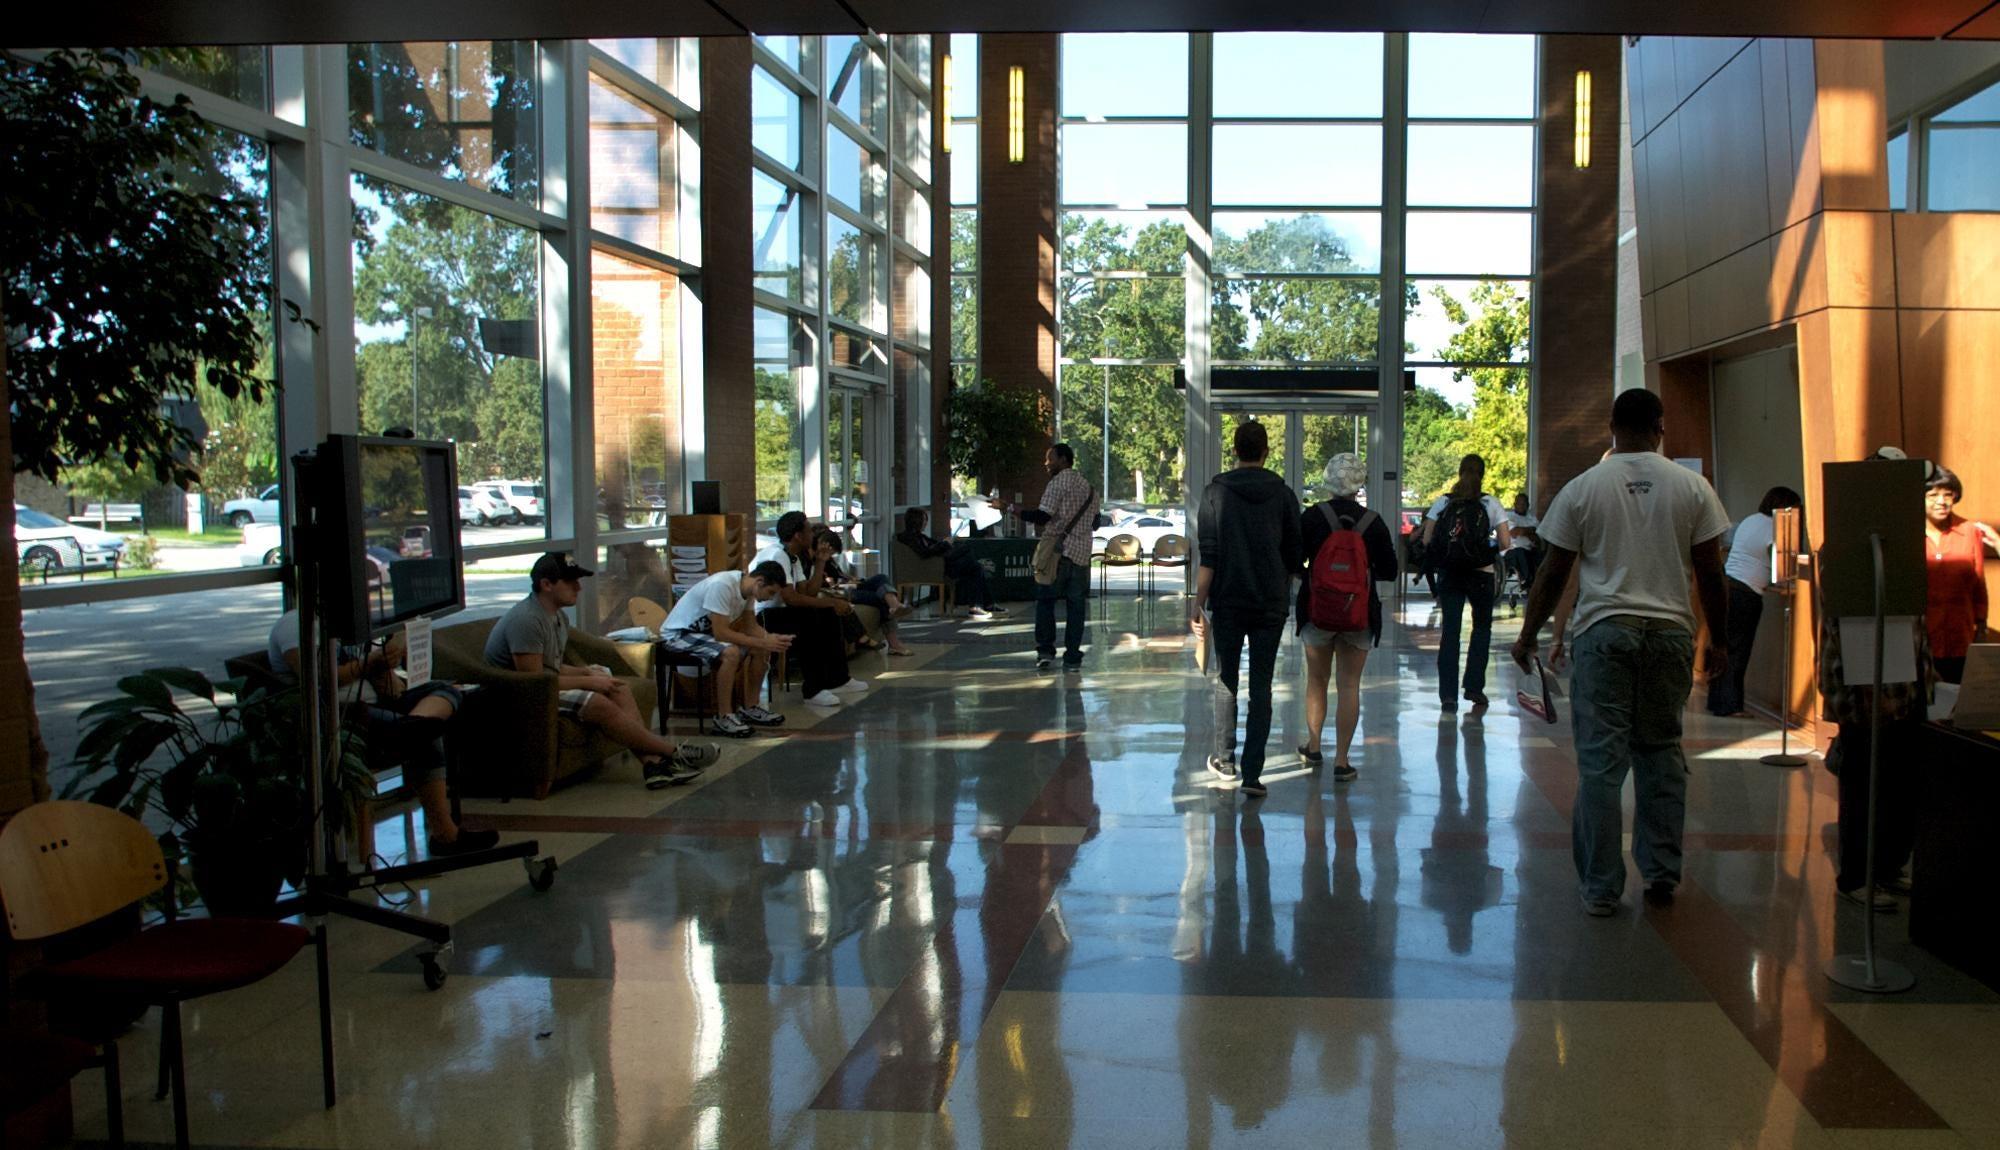 SLCC Summer Camps Beginning in June - Story   Lafayette, LA